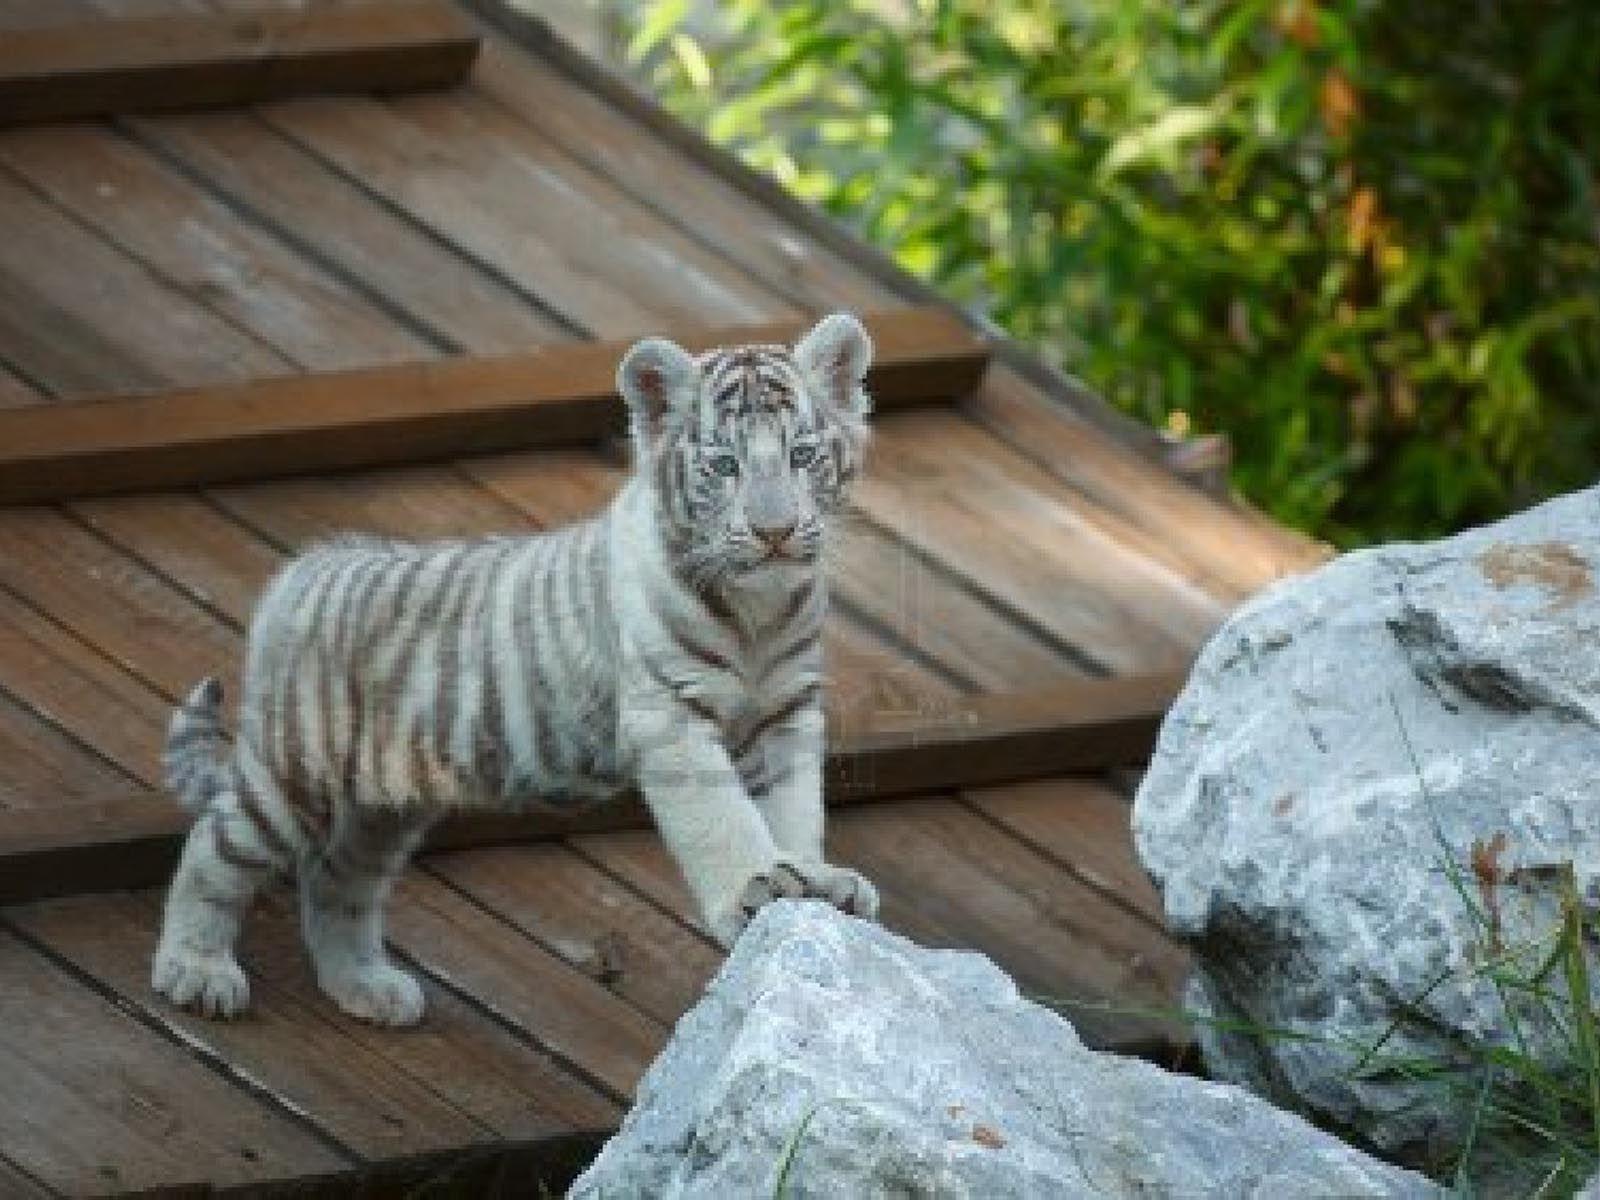 tiger wallpapers free download white cute cub animal hd desktop | hd